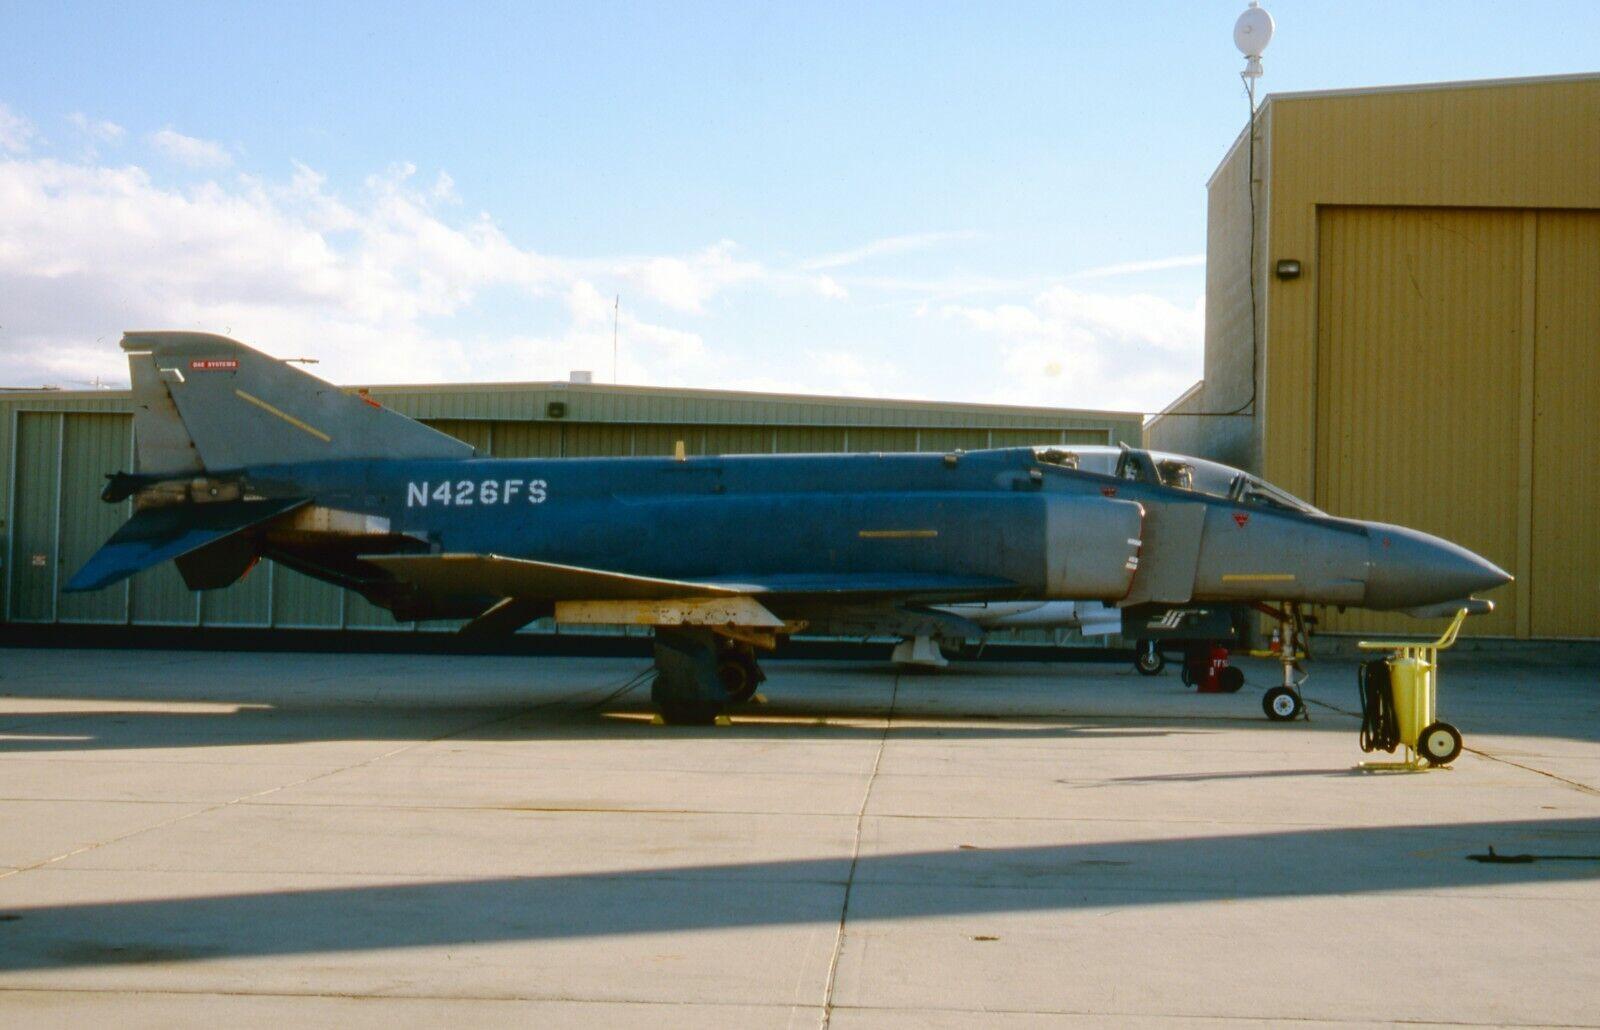 BAE N426FS McDonnell Douglas F-4D Phantom II Experimental Photo Print